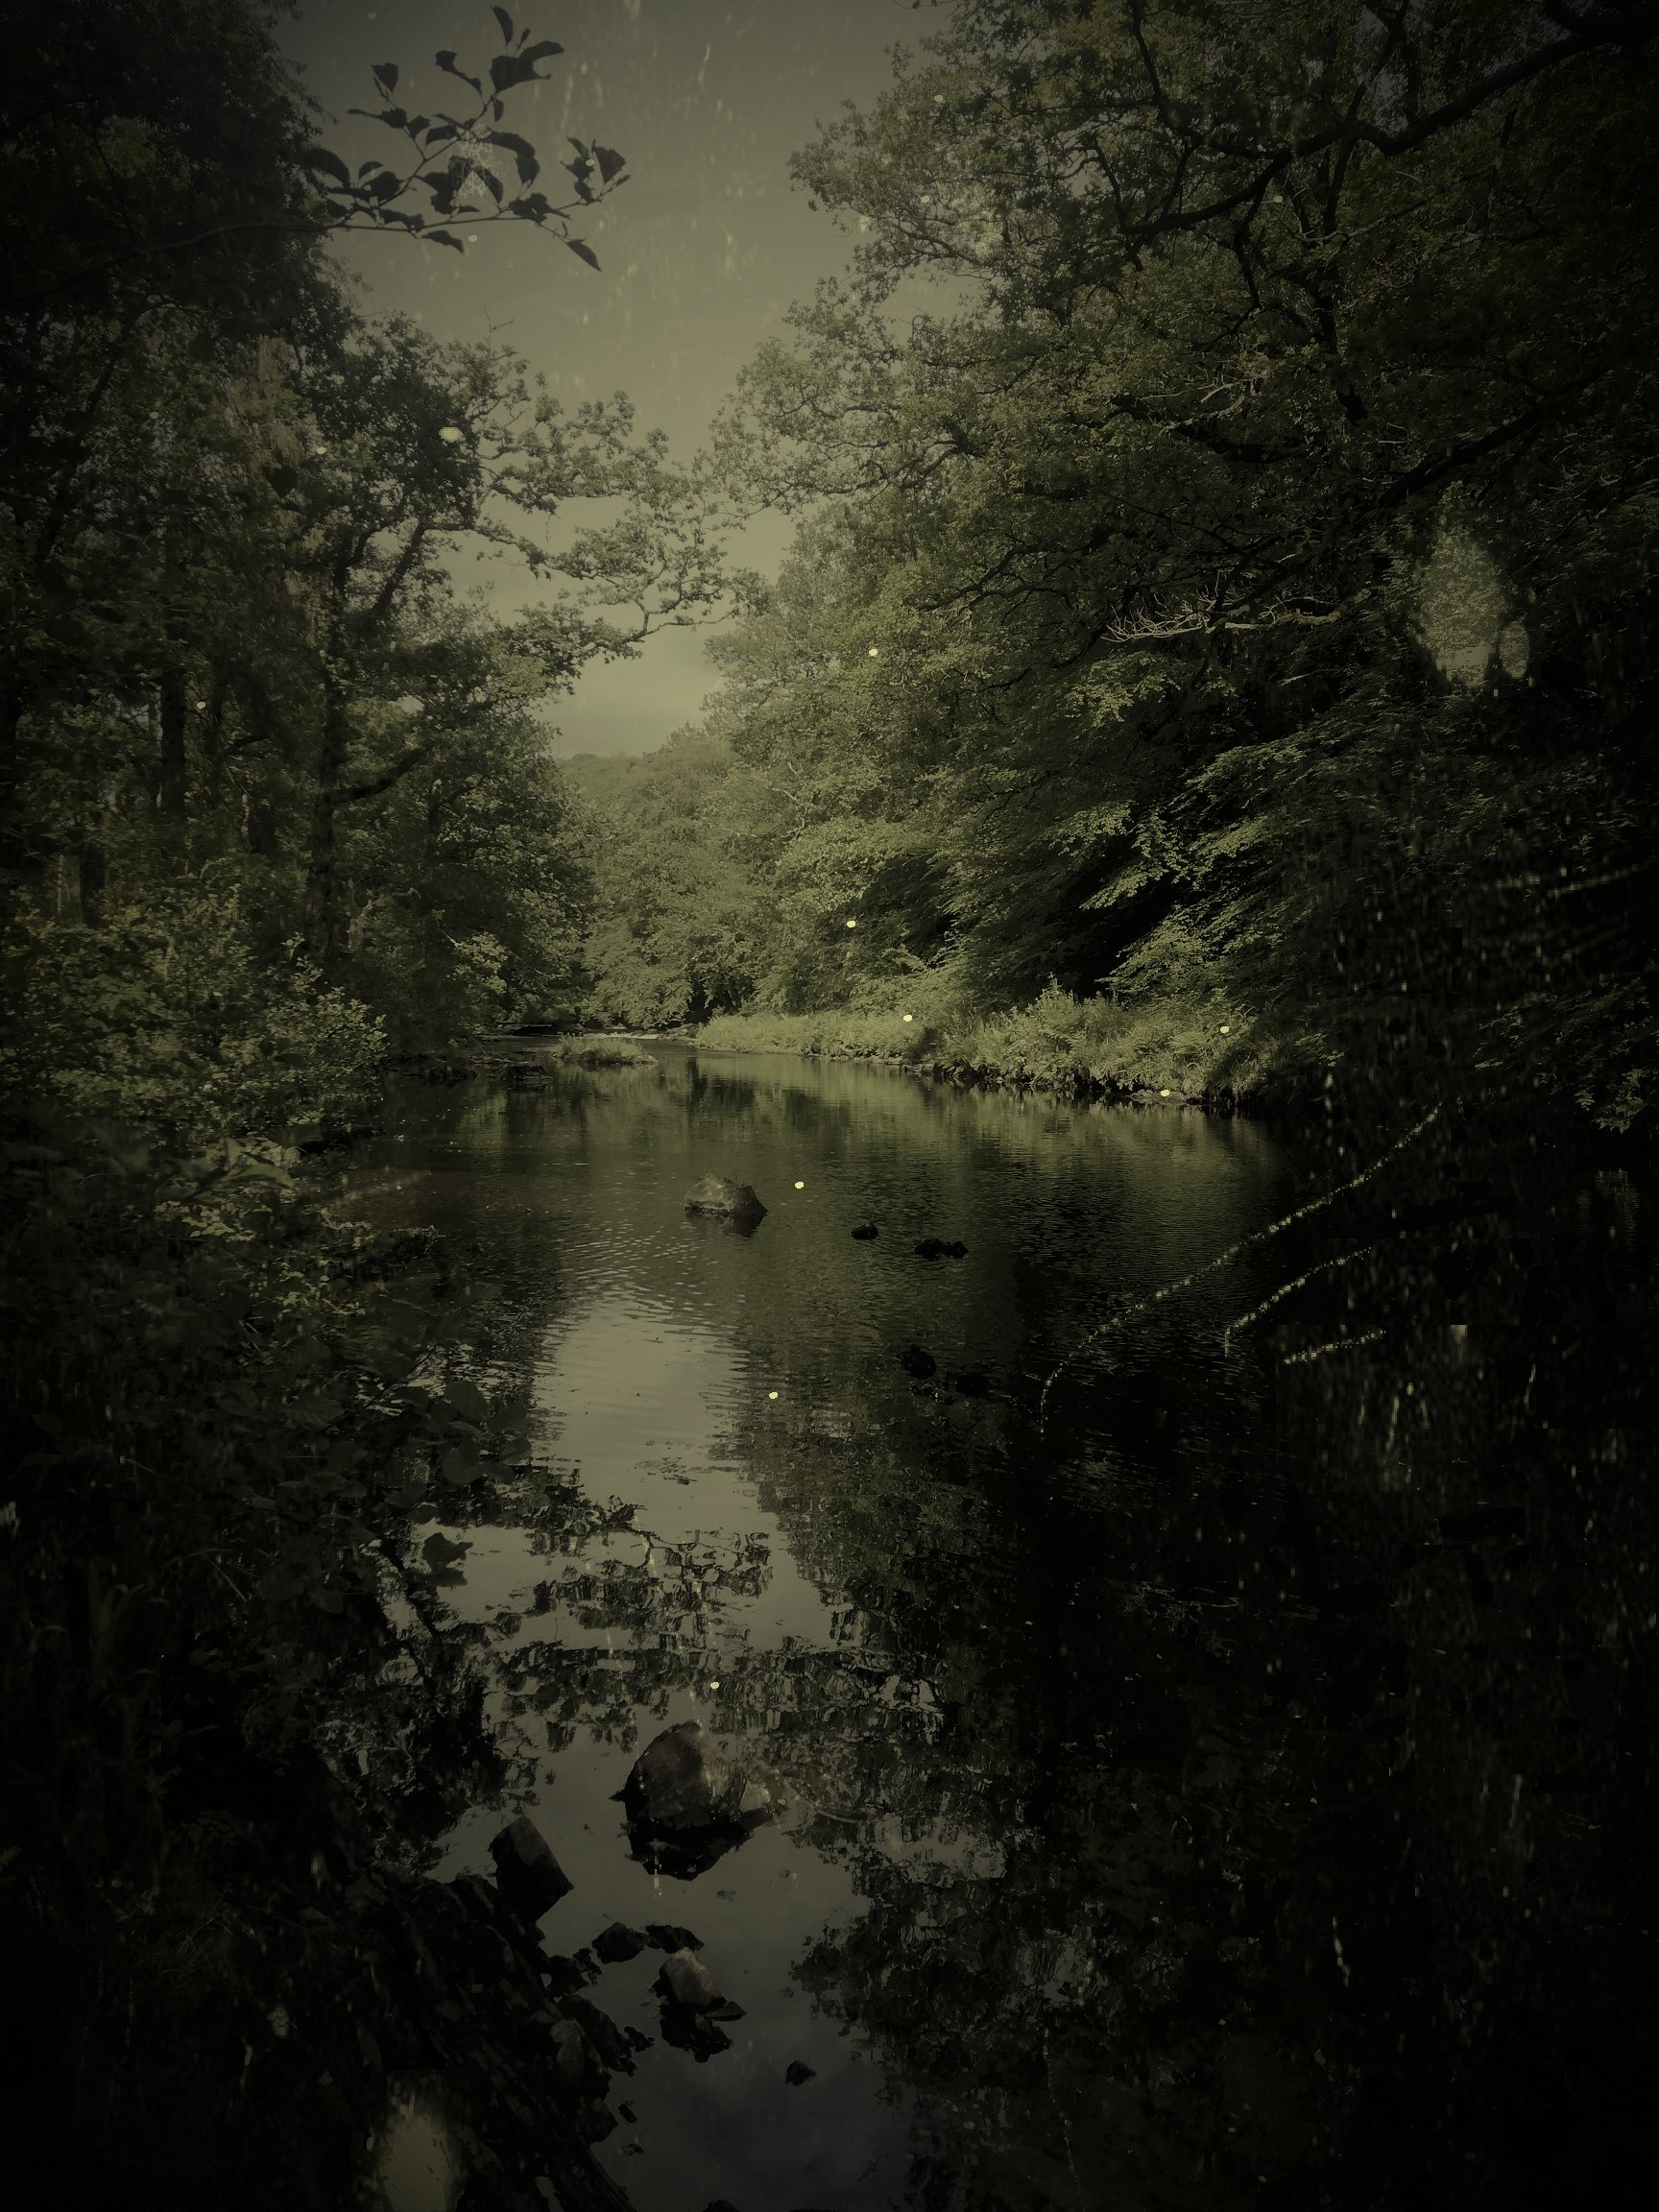 A dark river